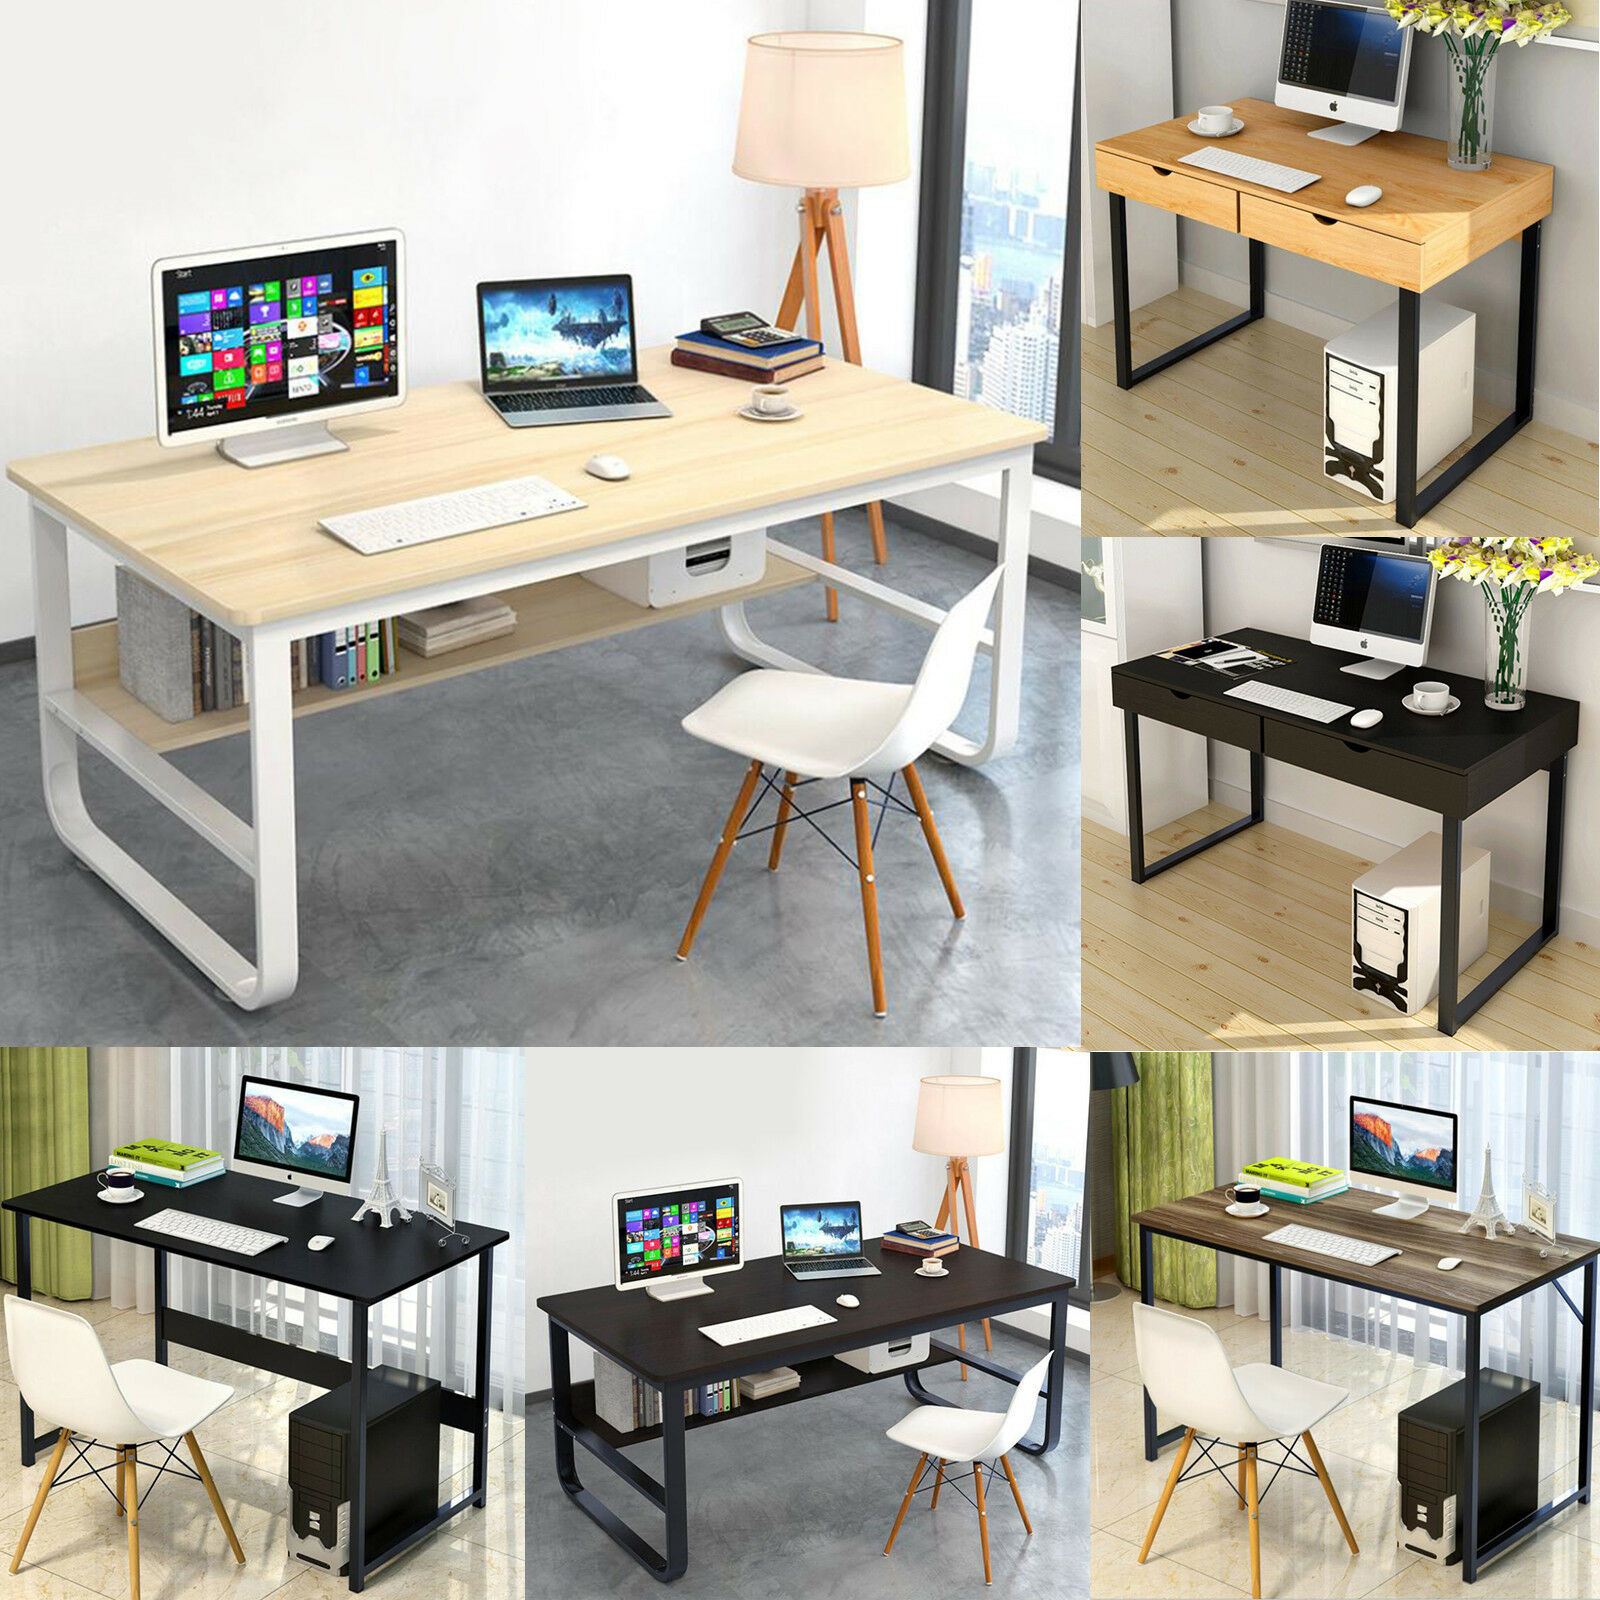 UK/US Home Computer Desk Table Workstation Office Laptop PC Desktop Study Shelf Office With 2 Drawers / Bookshelf  2 Color